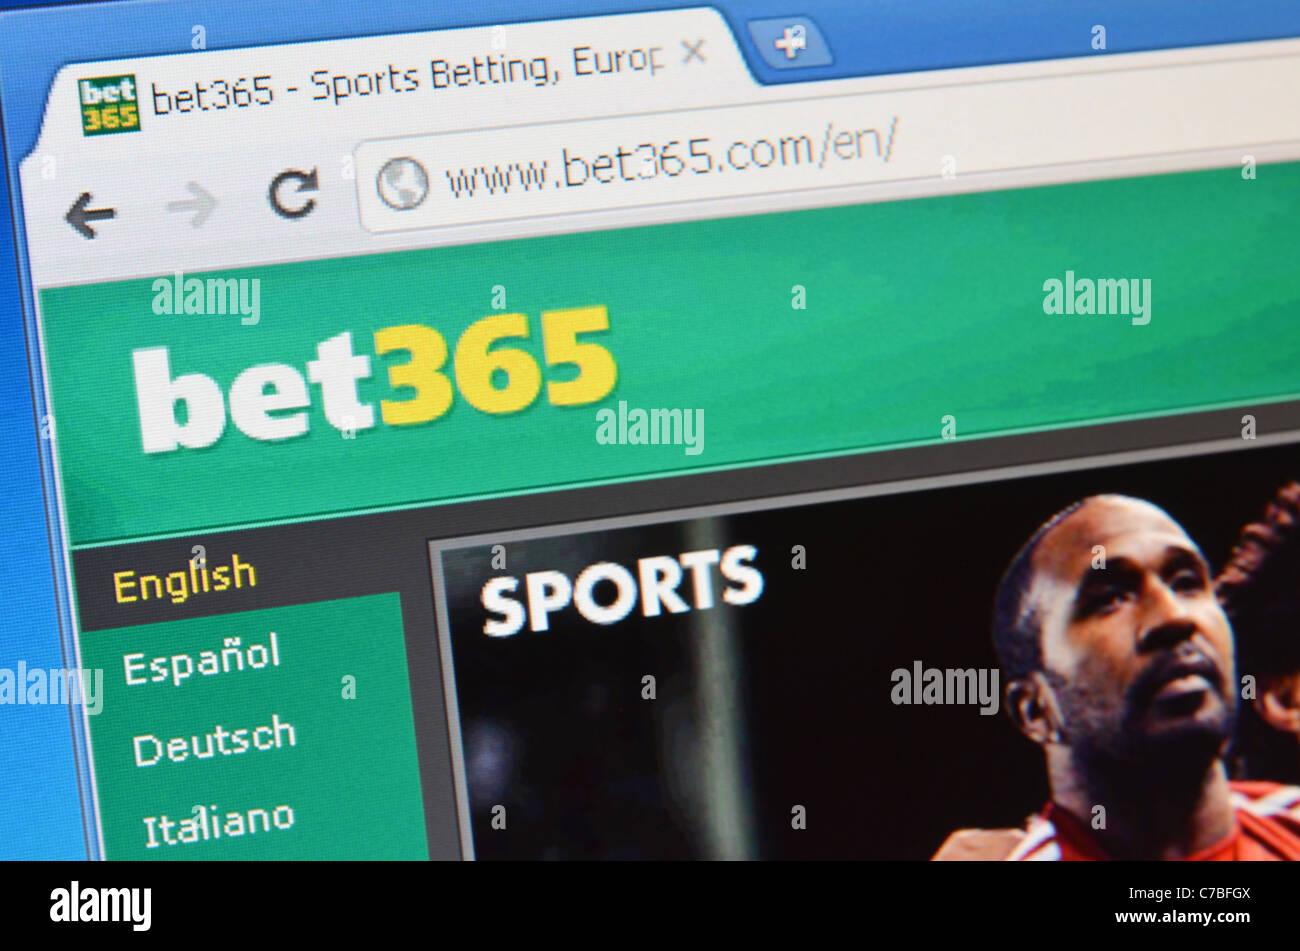 italia betting 365 online